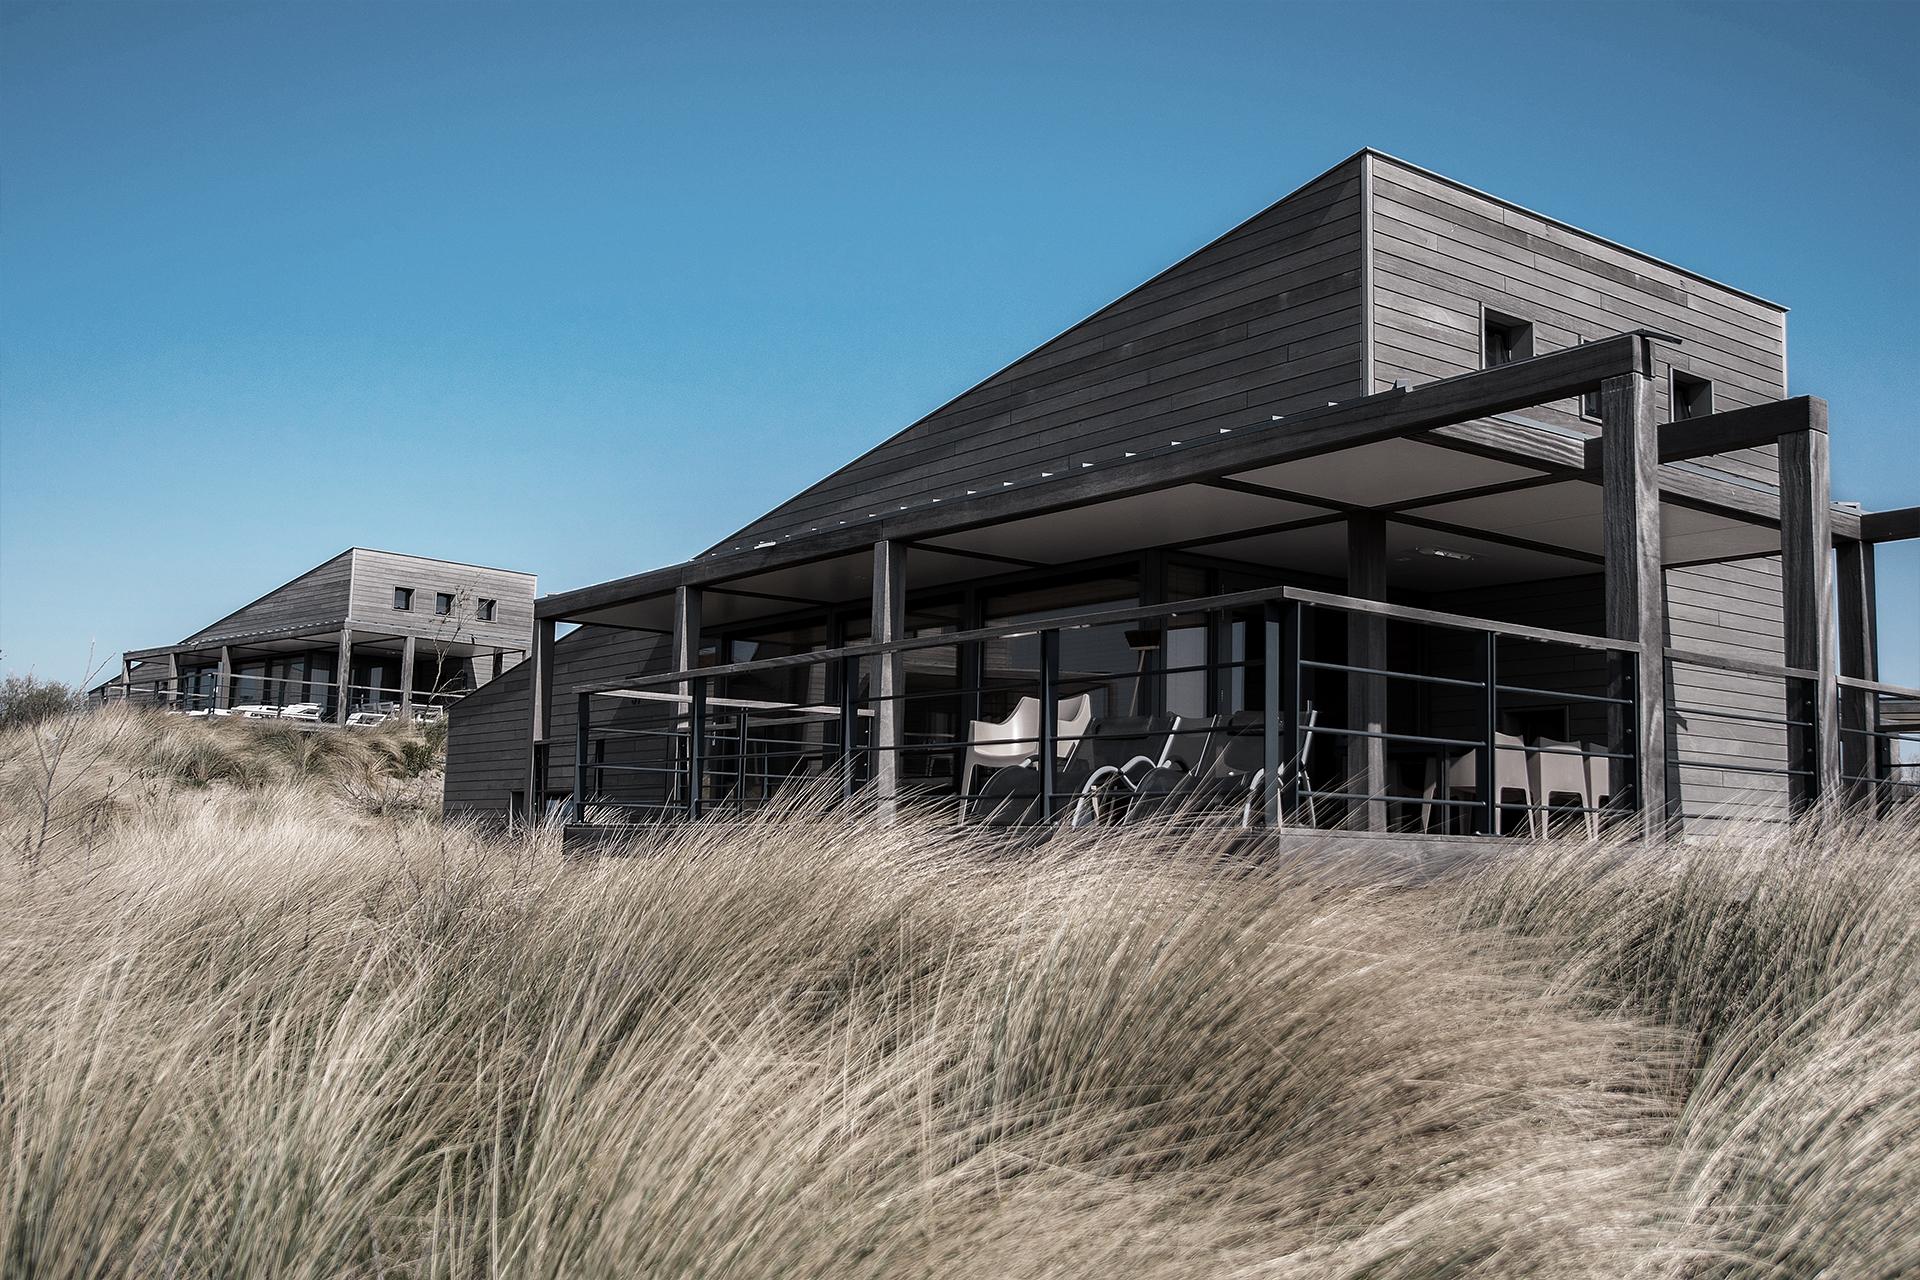 Punt West Hotel & Beach Resort (Brouwersdam) - hotelvilla